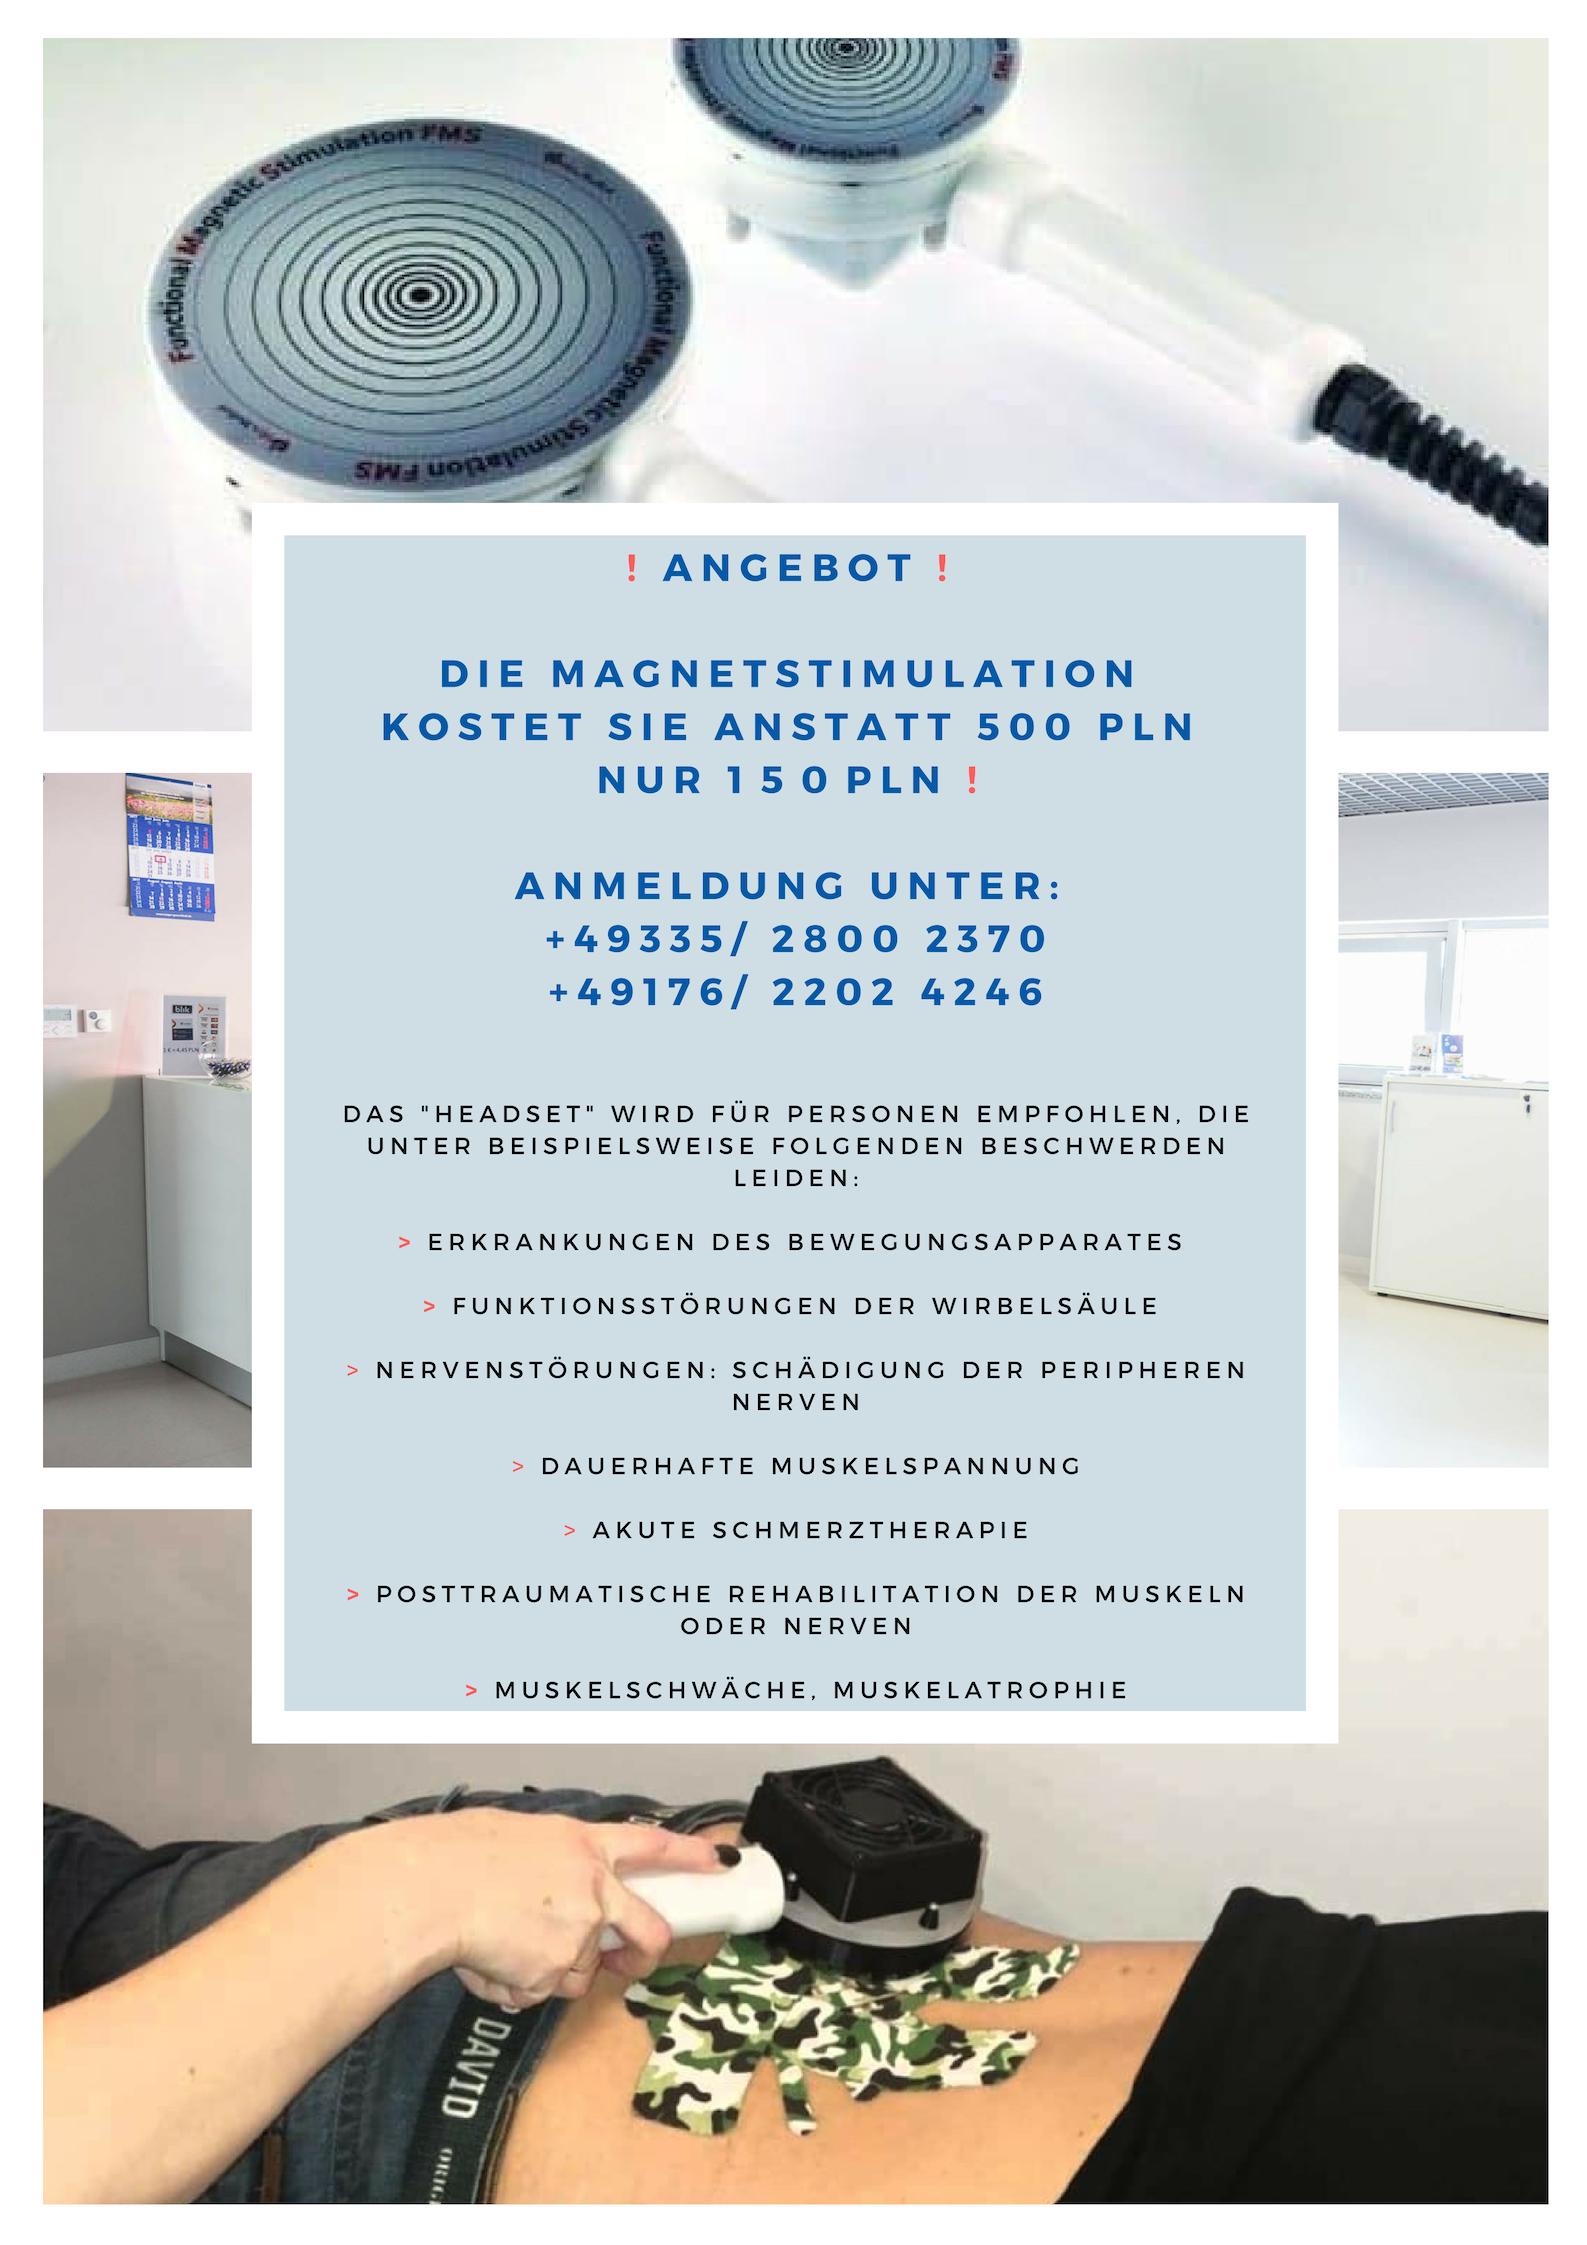 Magnetstimulation